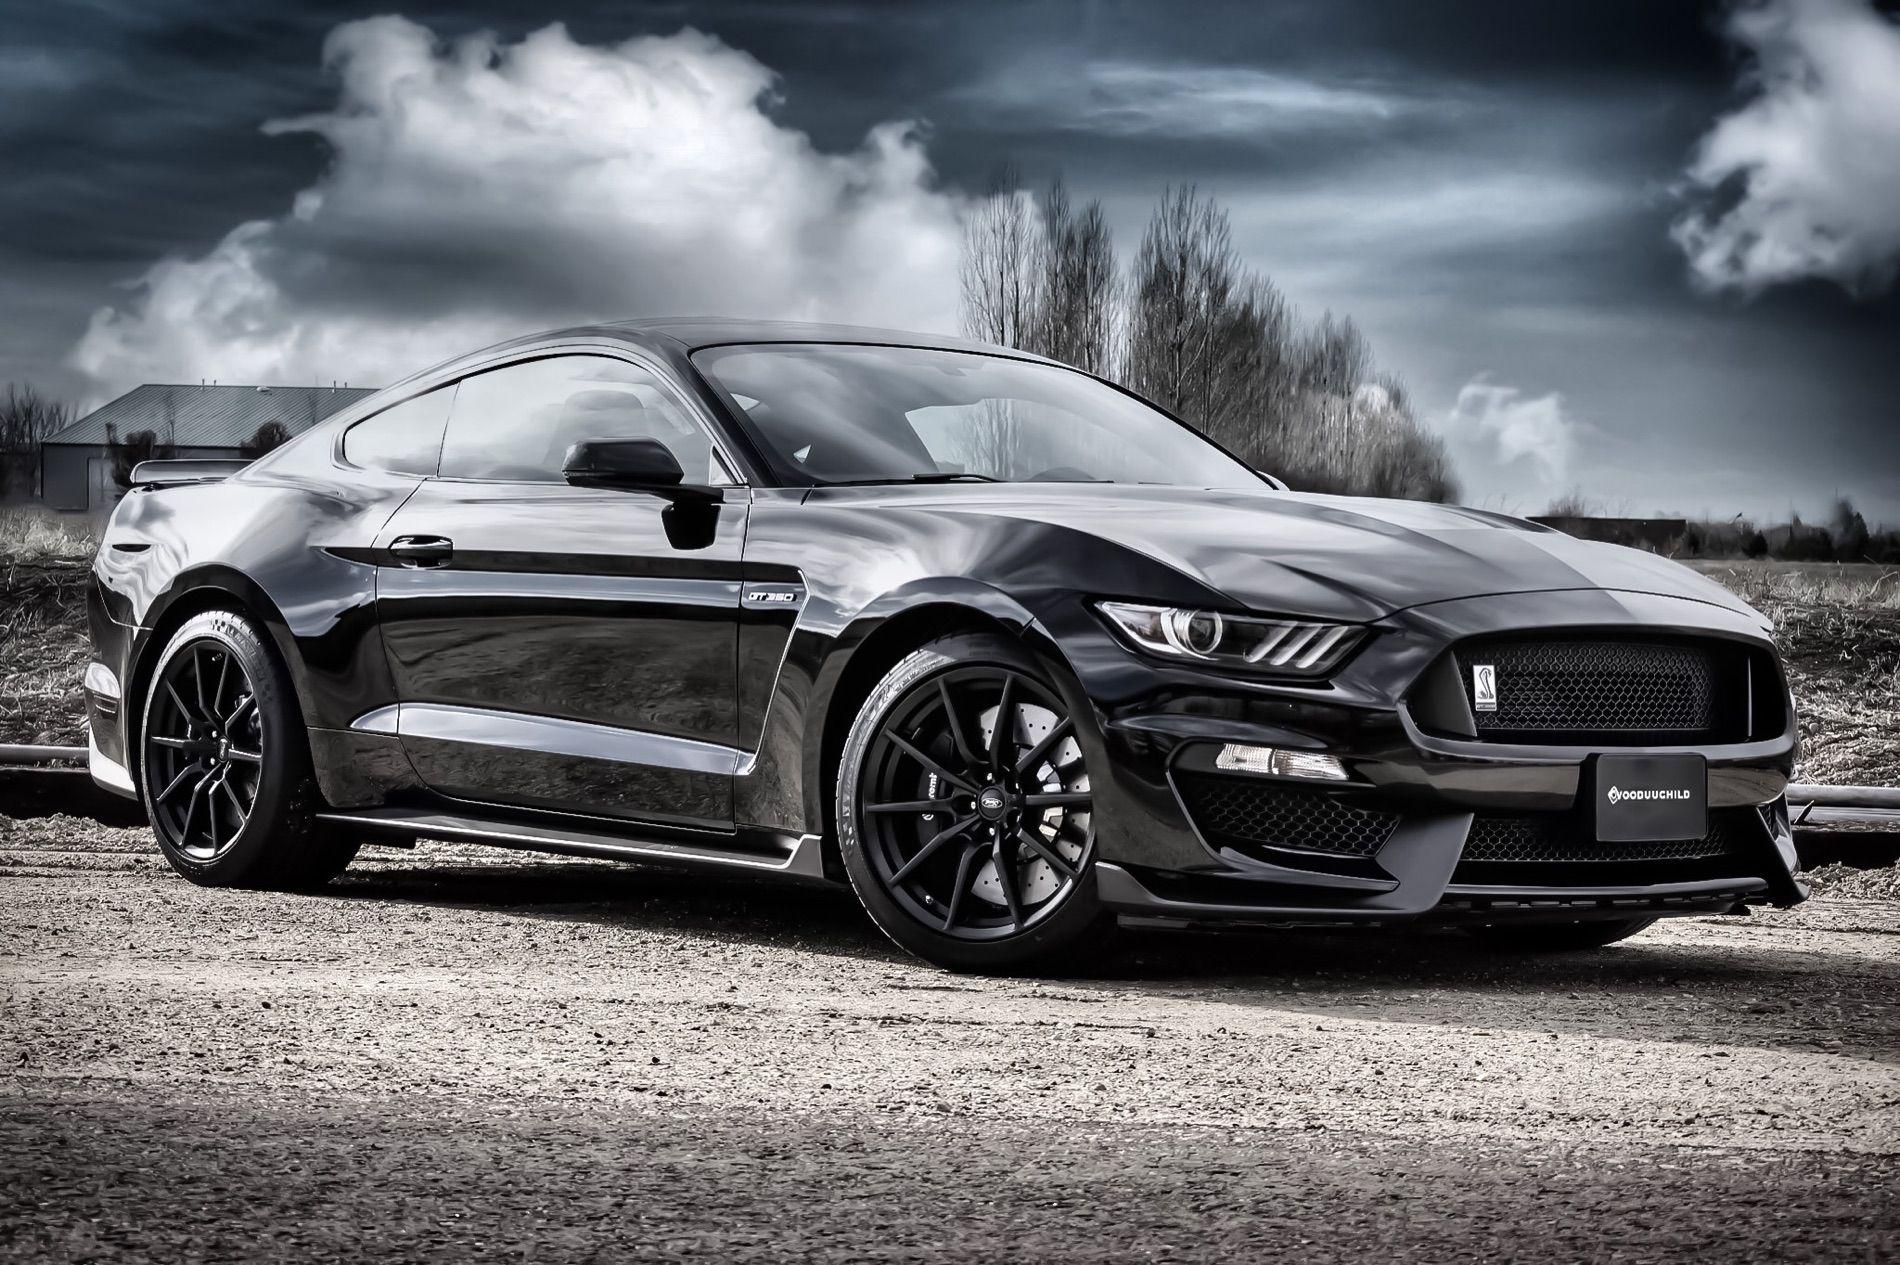 2018 Mustang6g Calendar Photo Contest